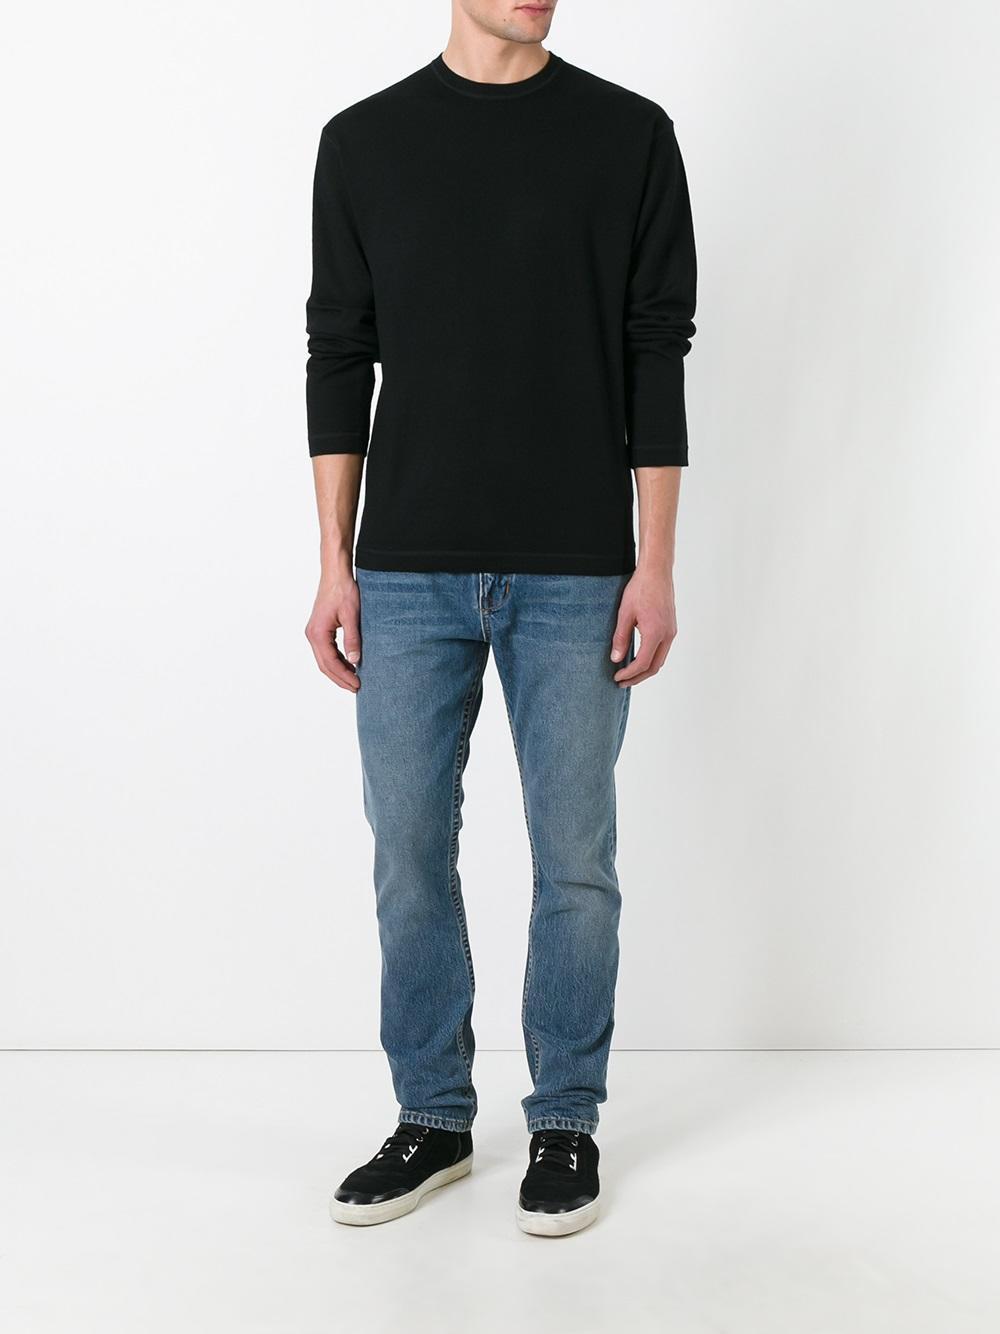 Helmut Lang Denim Tapered Jeans in Blue for Men